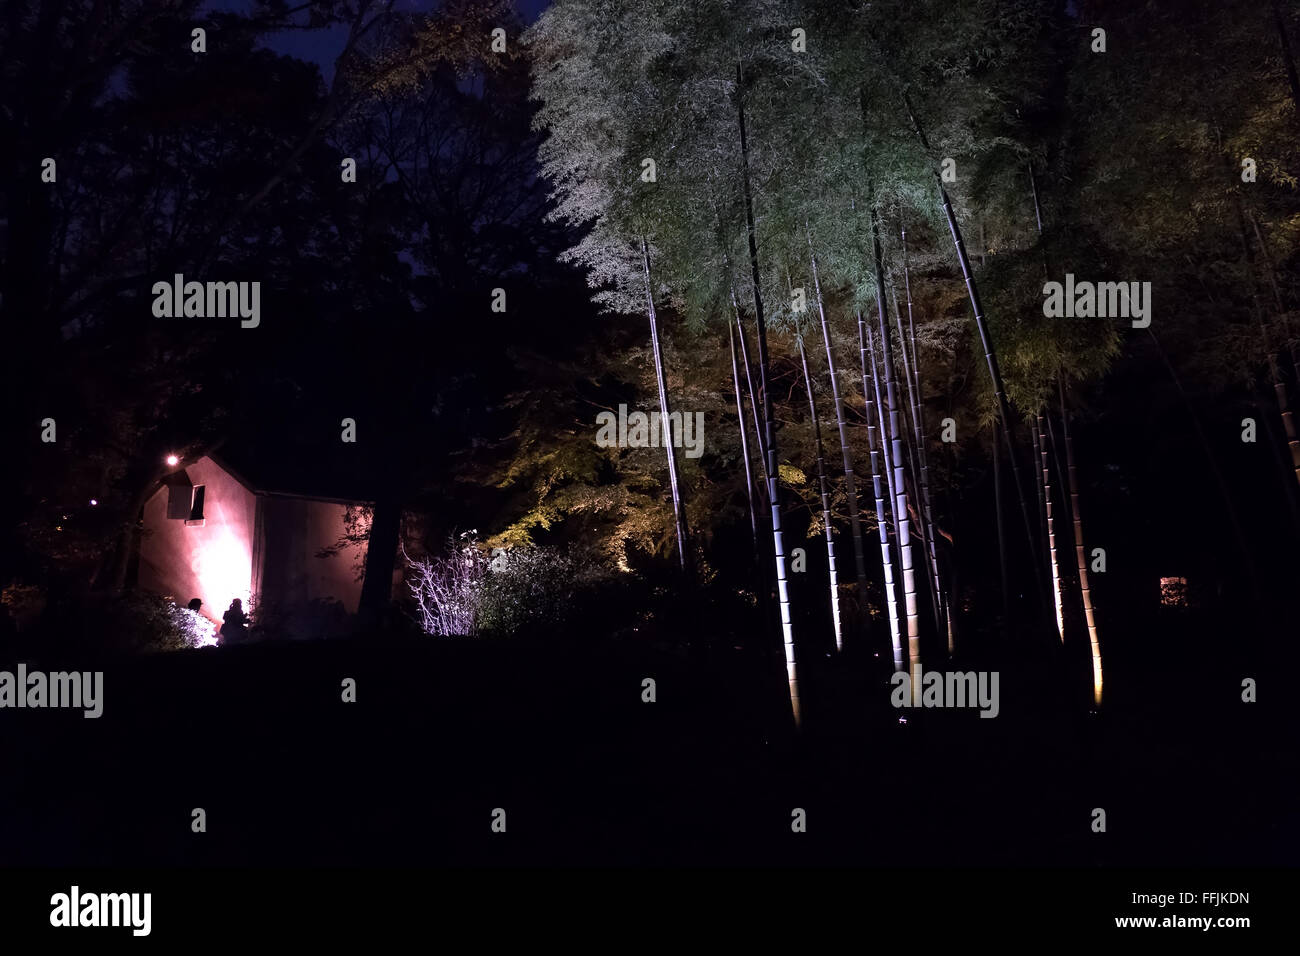 Rikugien Garden, Tokyo, Japan, Asia. City park, gardens in fall season, autumn foliage on trees, night lights. Japanese - Stock Image